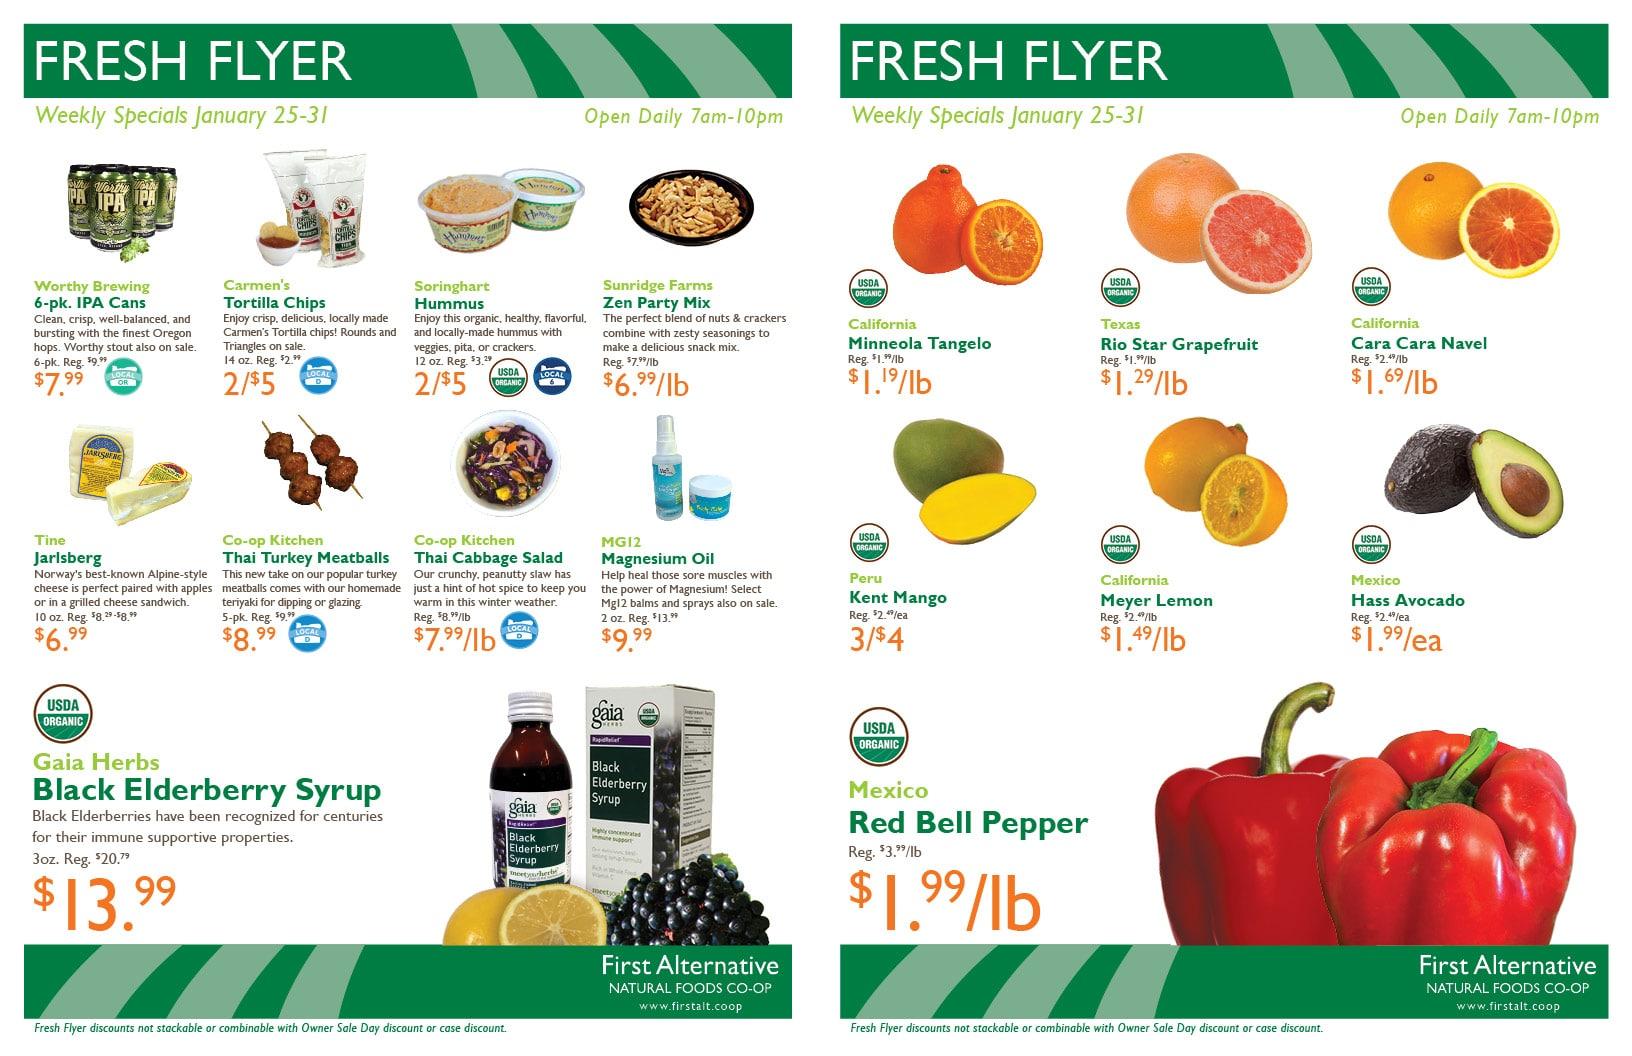 First Alternative Co-op Fresh Flyer Jan. 25-31